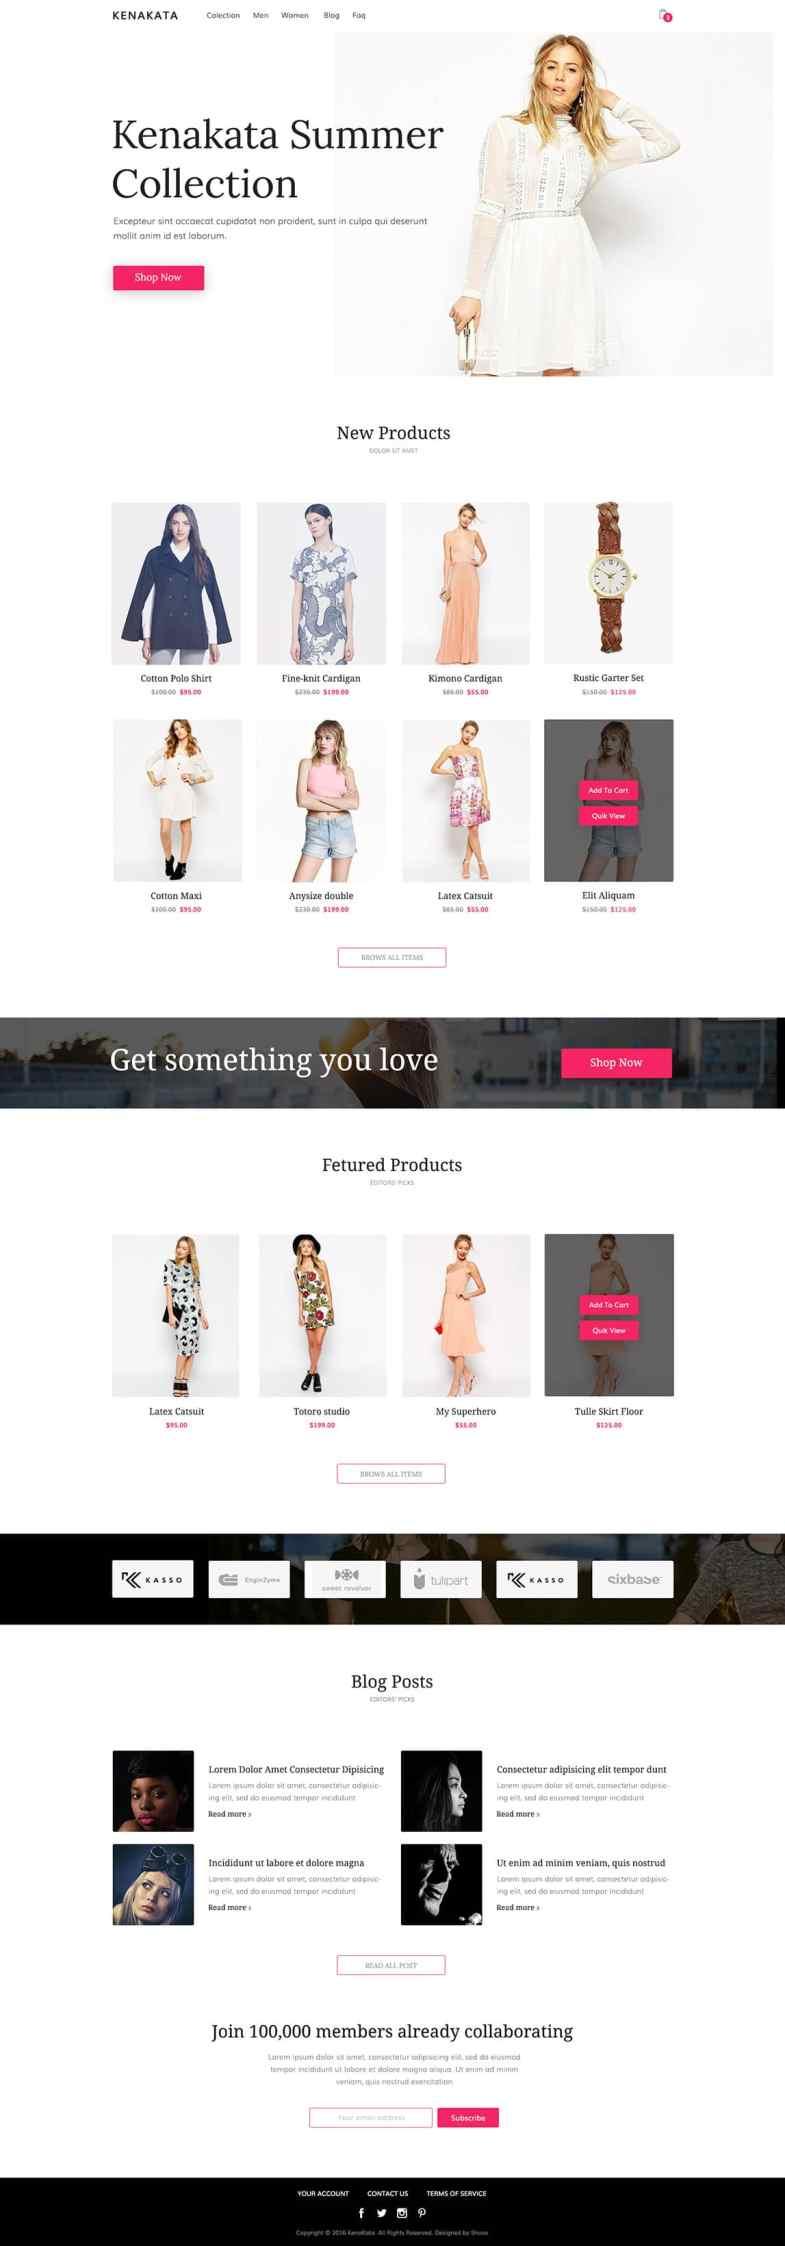 Kenakata - Free eCommerce Bootstrap Template Бесплатные шаблоны для интернет-магазина psd - Kenakata - Бесплатные шаблоны для интернет-магазина PSD